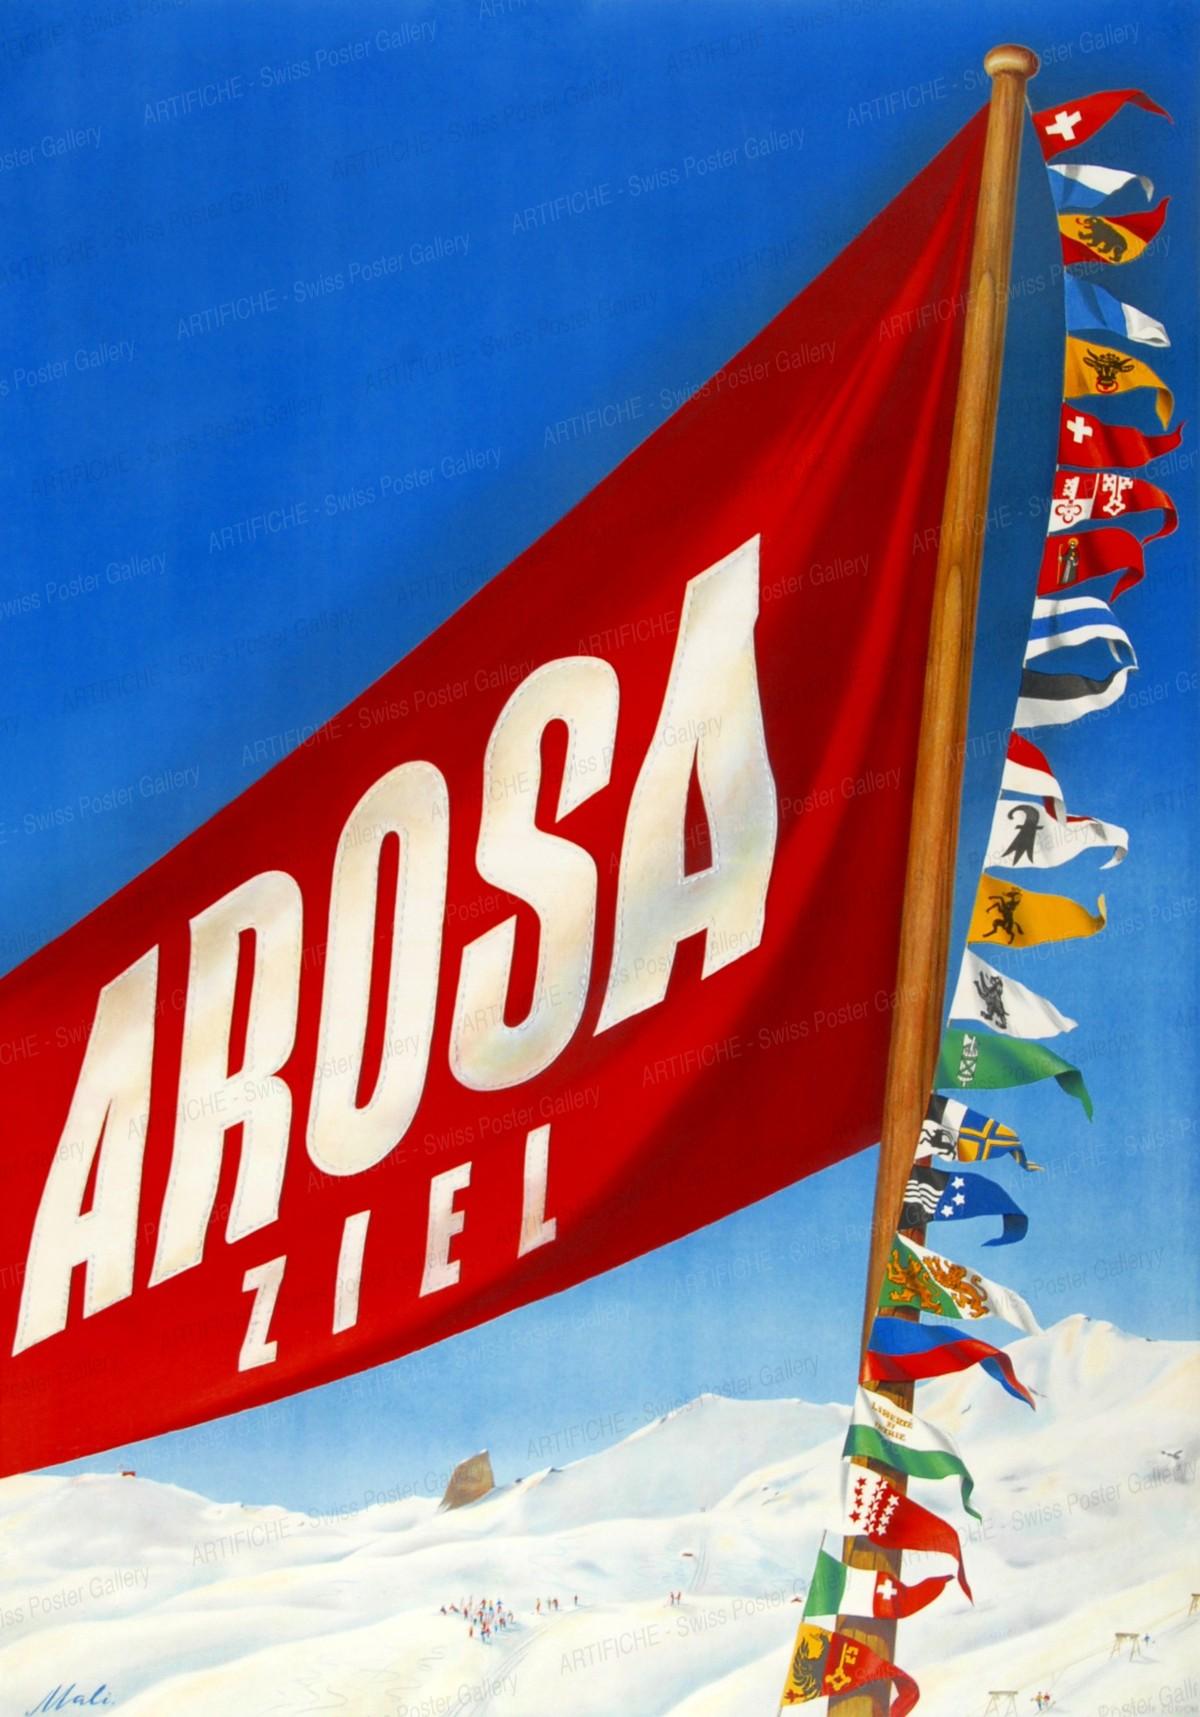 Arosa 6000 ft., Otto Malischke